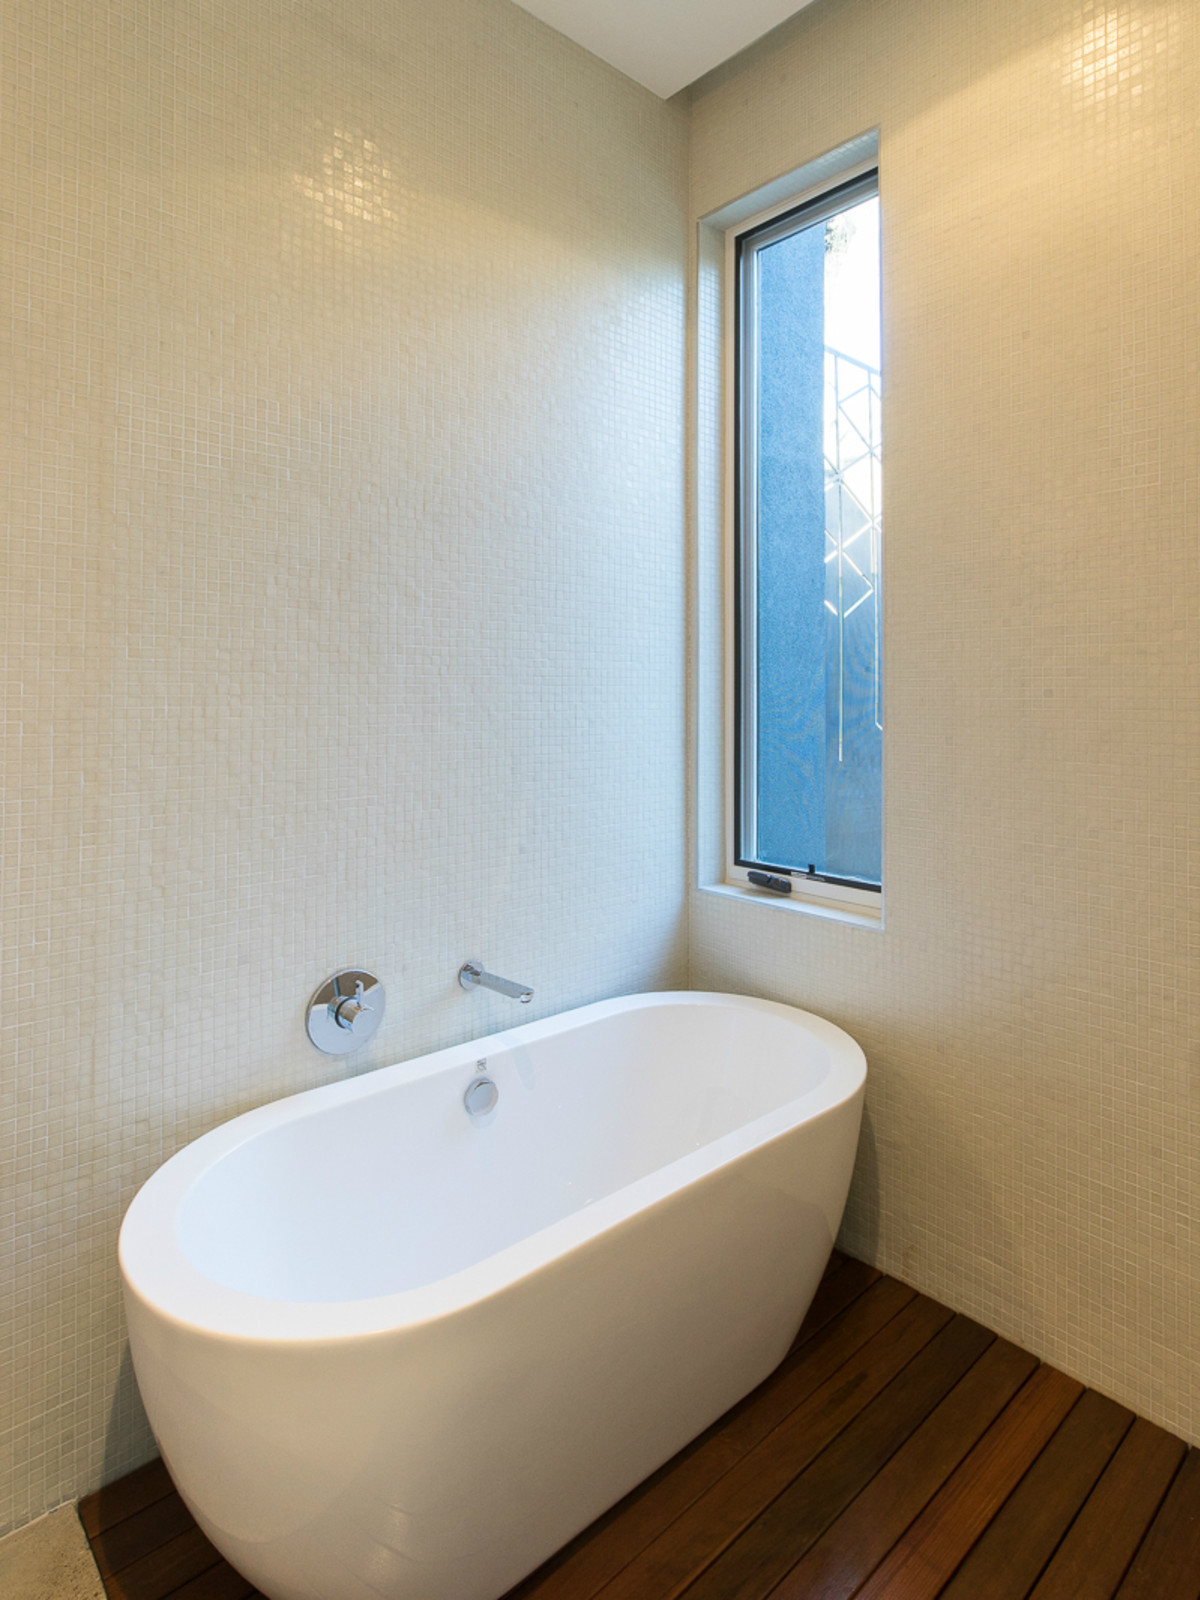 Austin house home dulplex 3305 Garden Villa Lane 78704 March 2016 bathroom tub